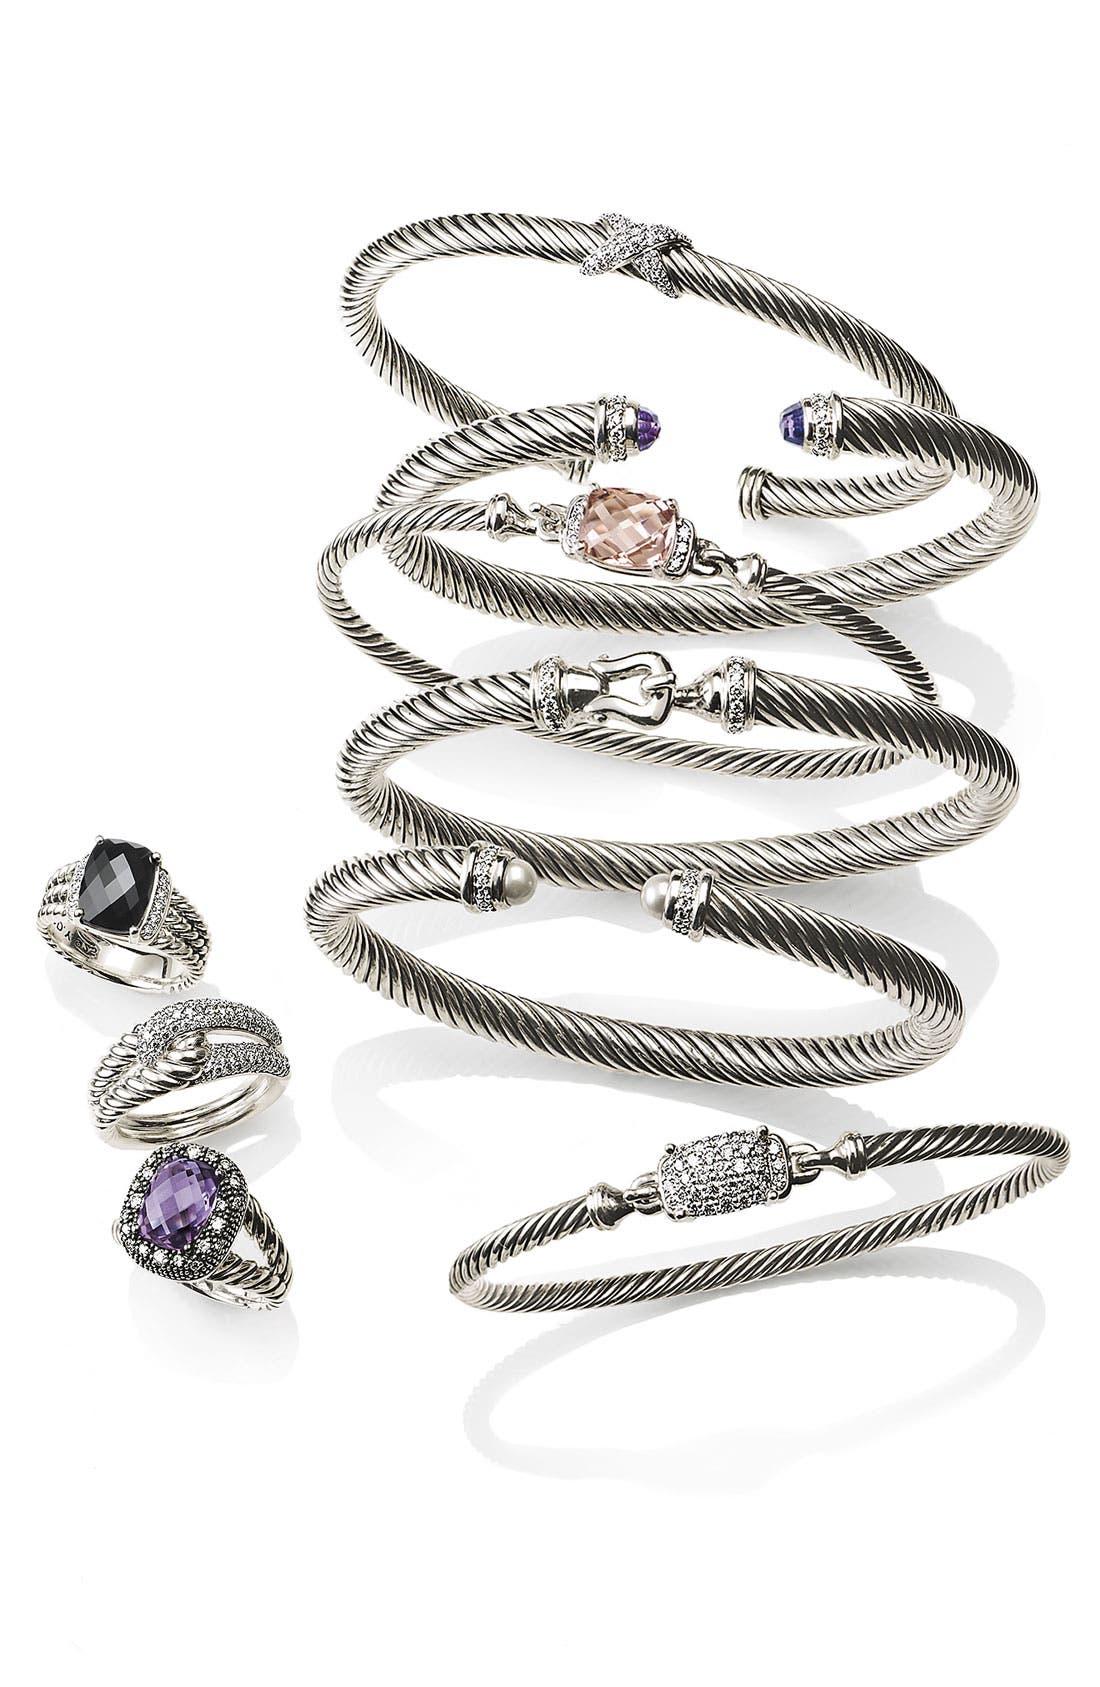 Cable Classics Bracelet with Semiprecious Stones & Diamonds, 5mm,                             Alternate thumbnail 2, color,                             BLUE TOPAZ